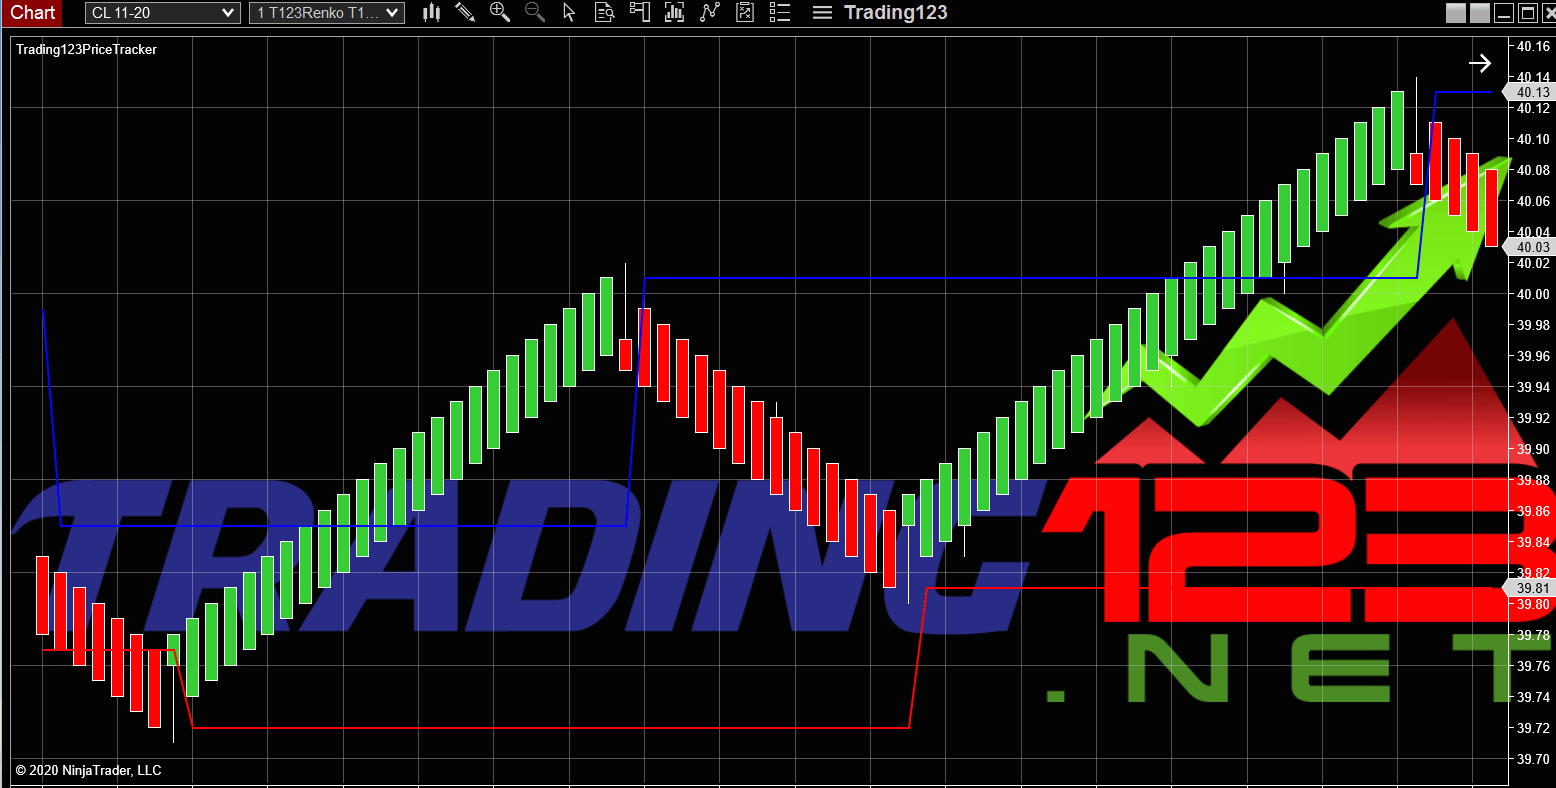 NinjaTrader 8 Indicators